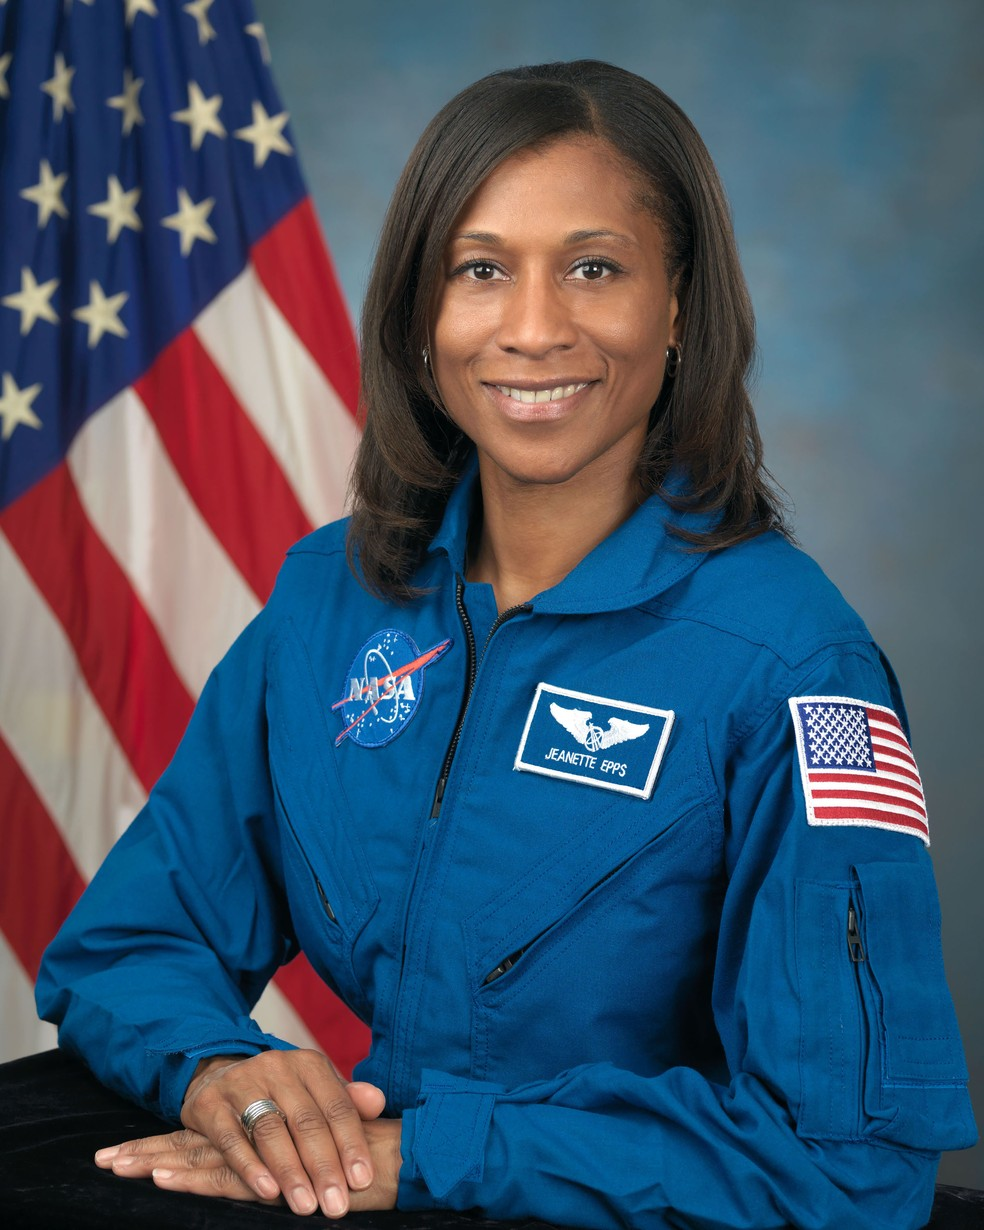 Foto da Nasa de 2009 mostra a astronauta Jeanette Epps  (Foto: Handout / NASA / AFP)